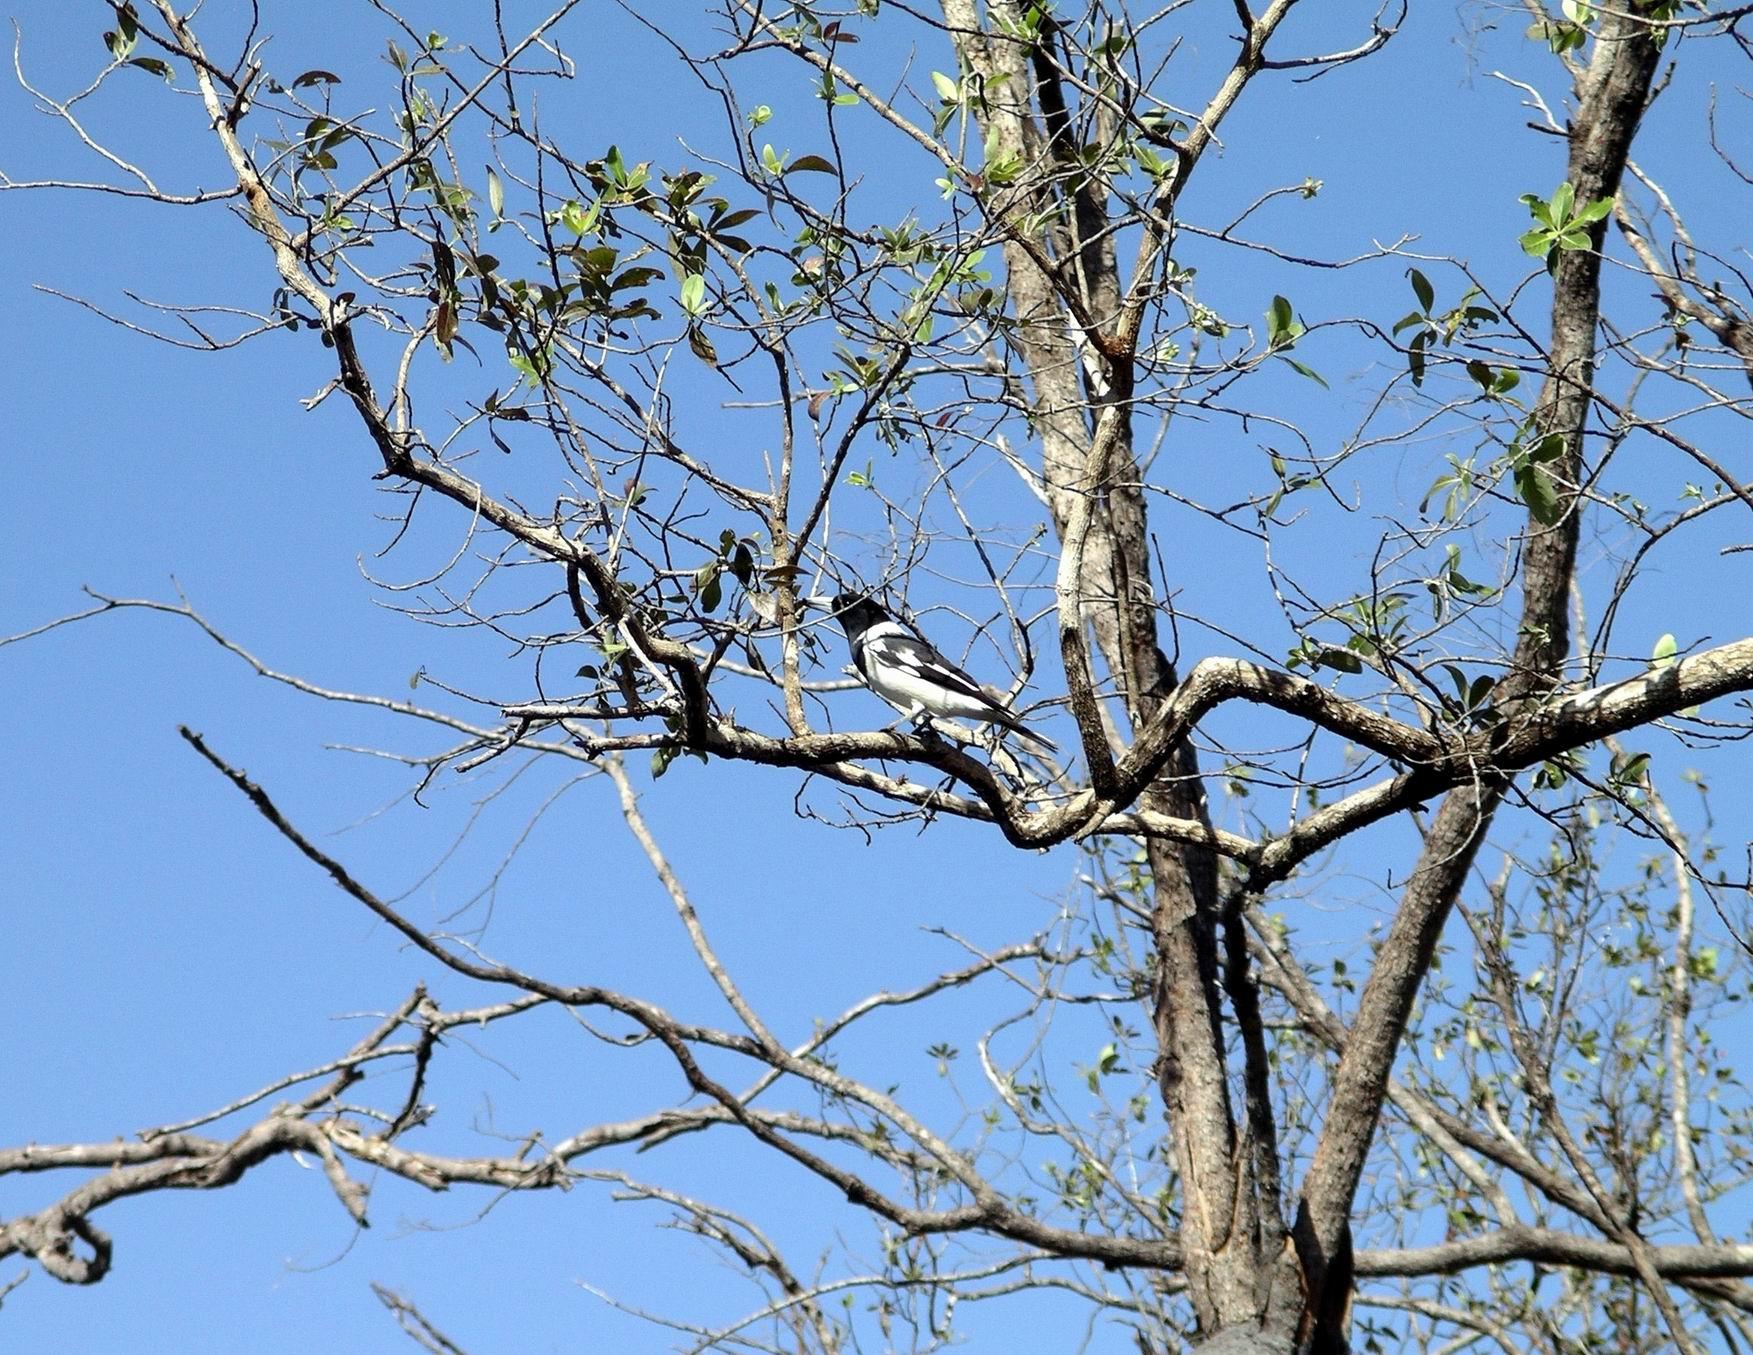 Resize of 06-04-2005 04 Pied Butcher Bird